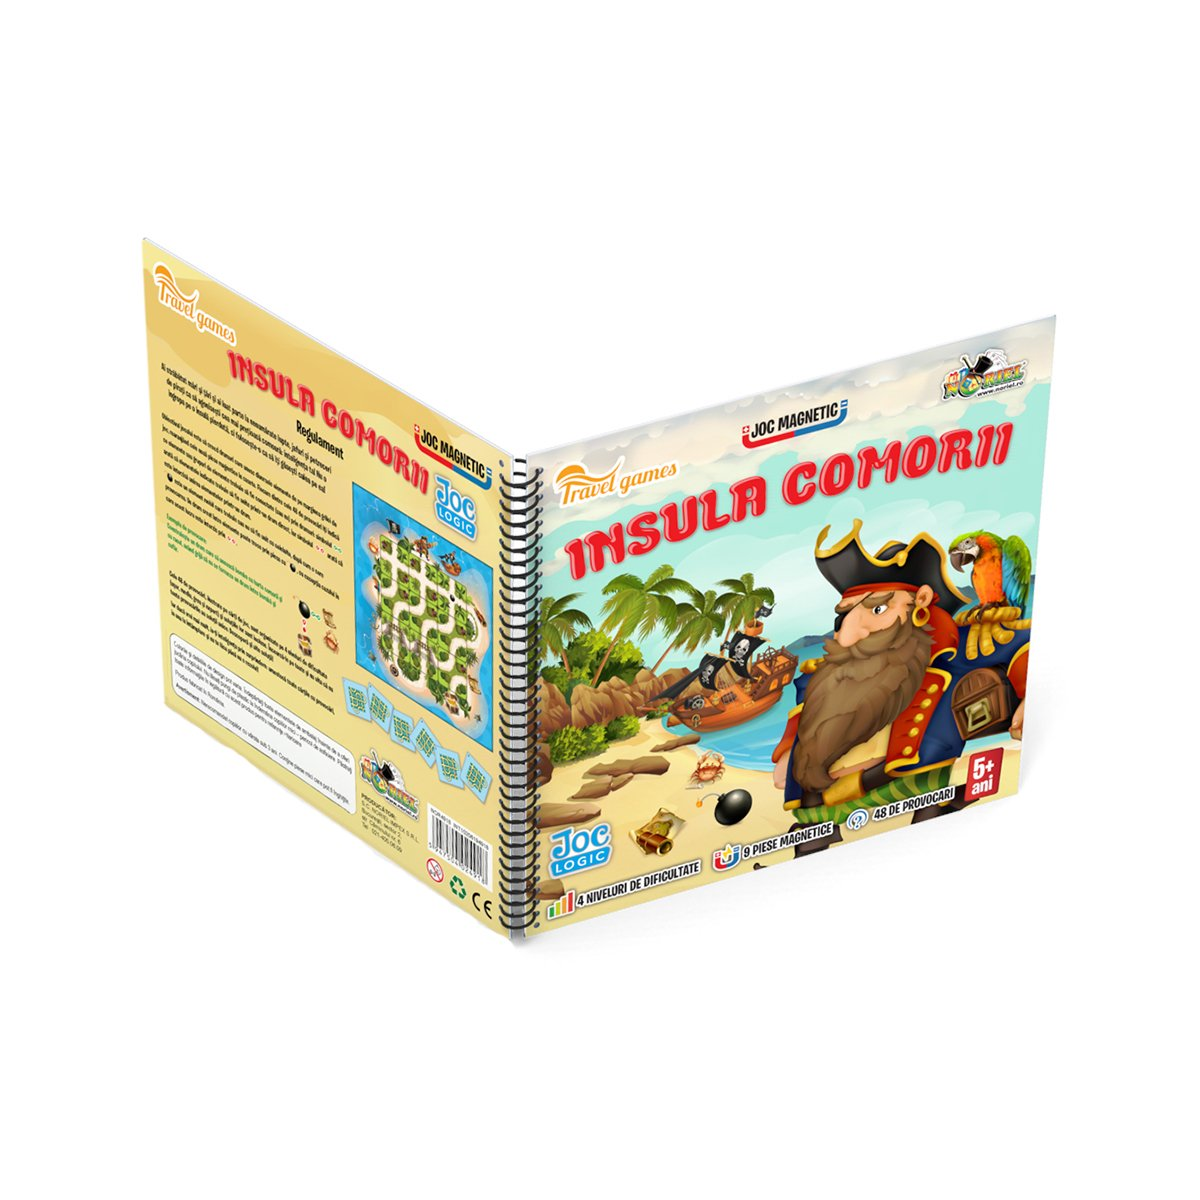 Joc magnetic interactiv Noriel Games, Insula comorii